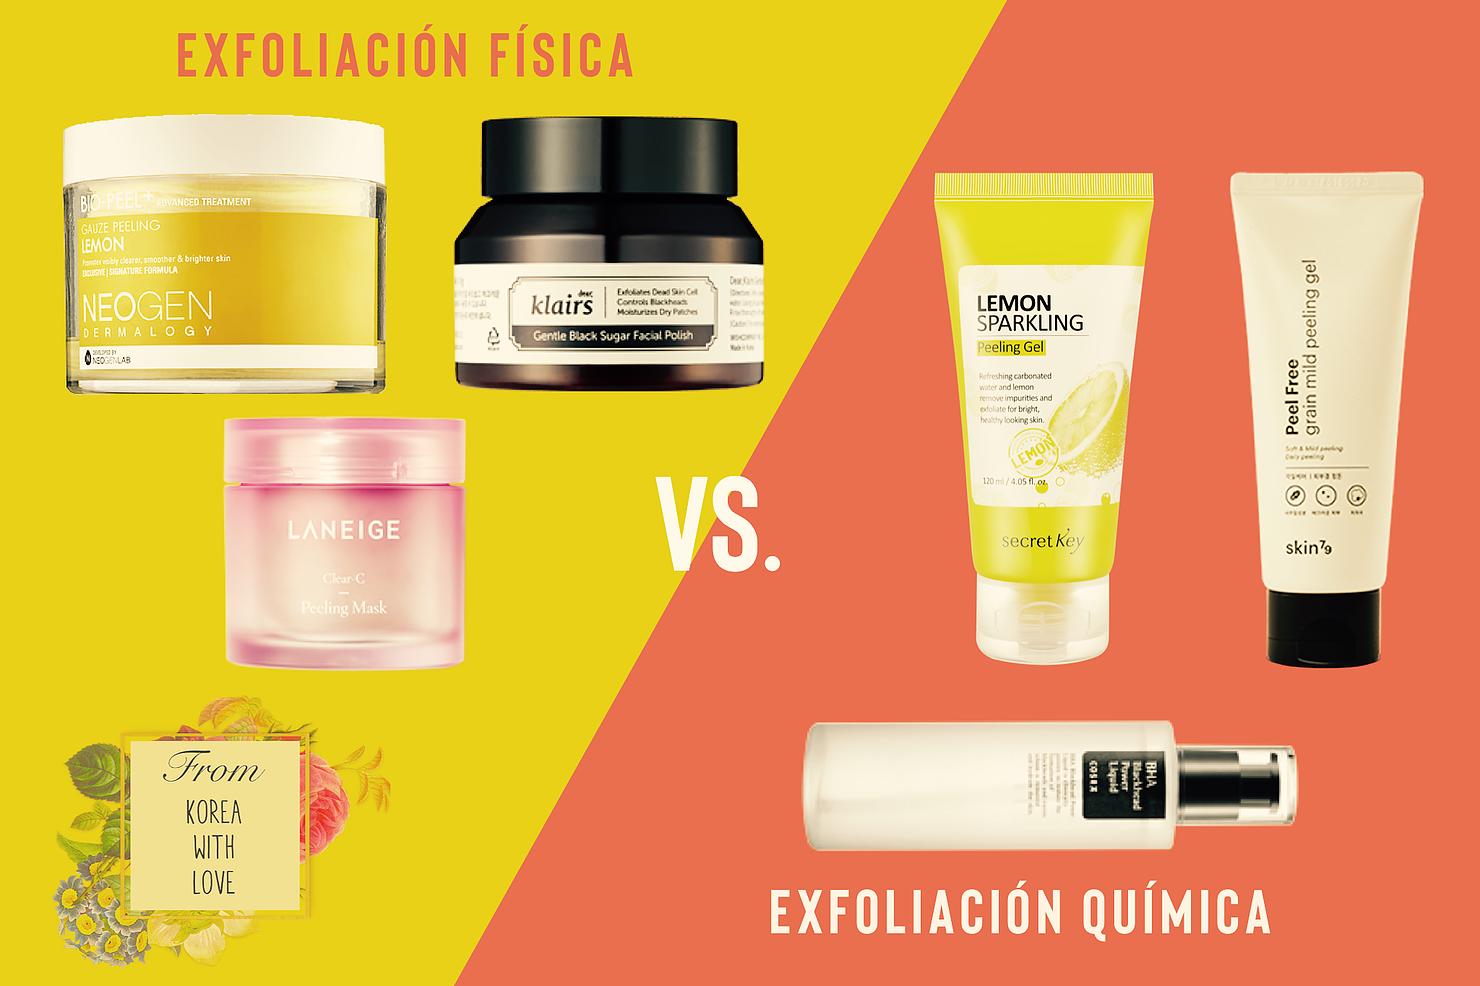 Exfoliación física vs. química